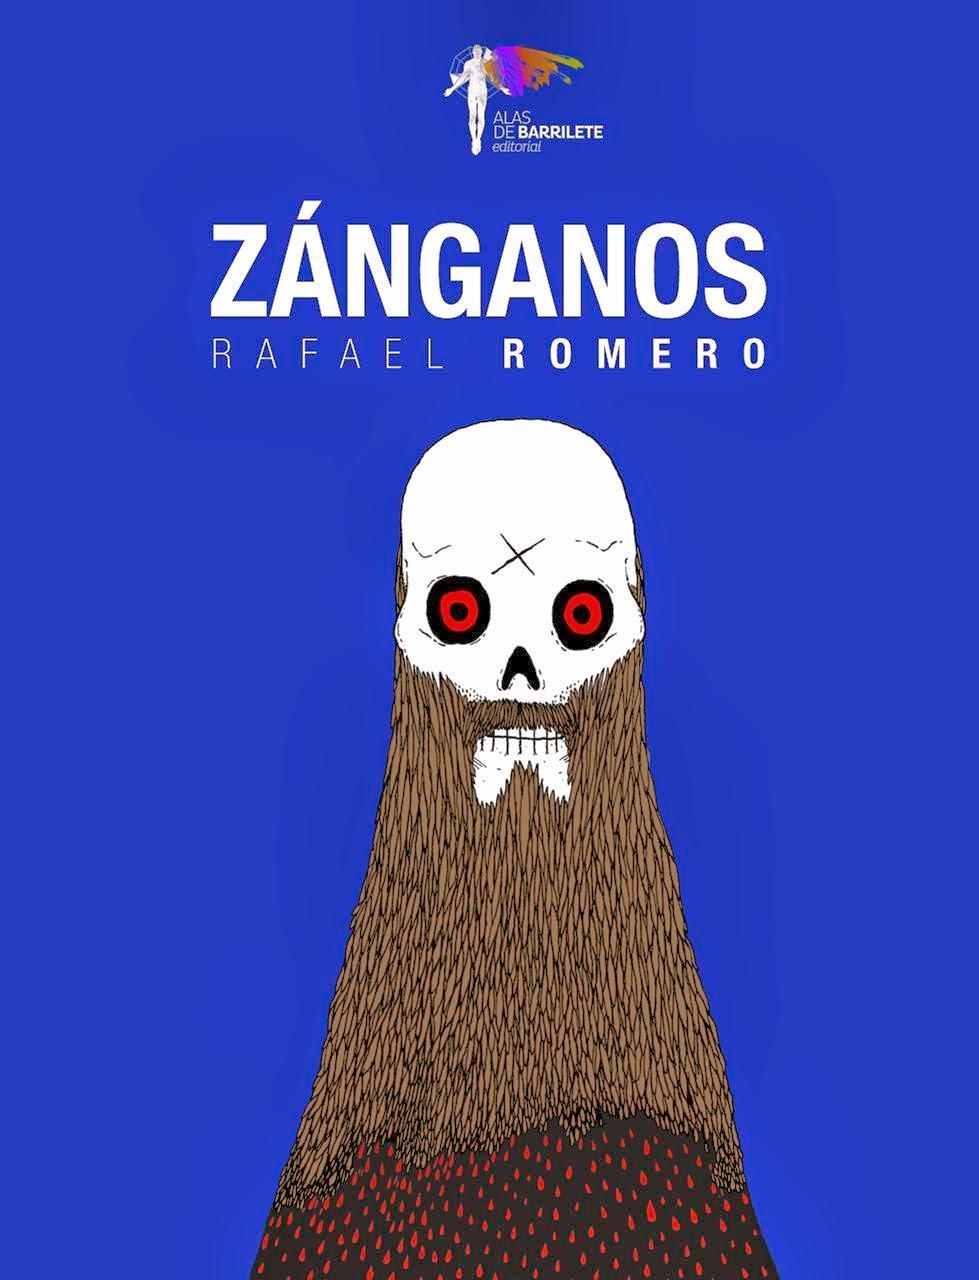 ZÁNGANOS (Novela, Alas de Barrilete, 2014)